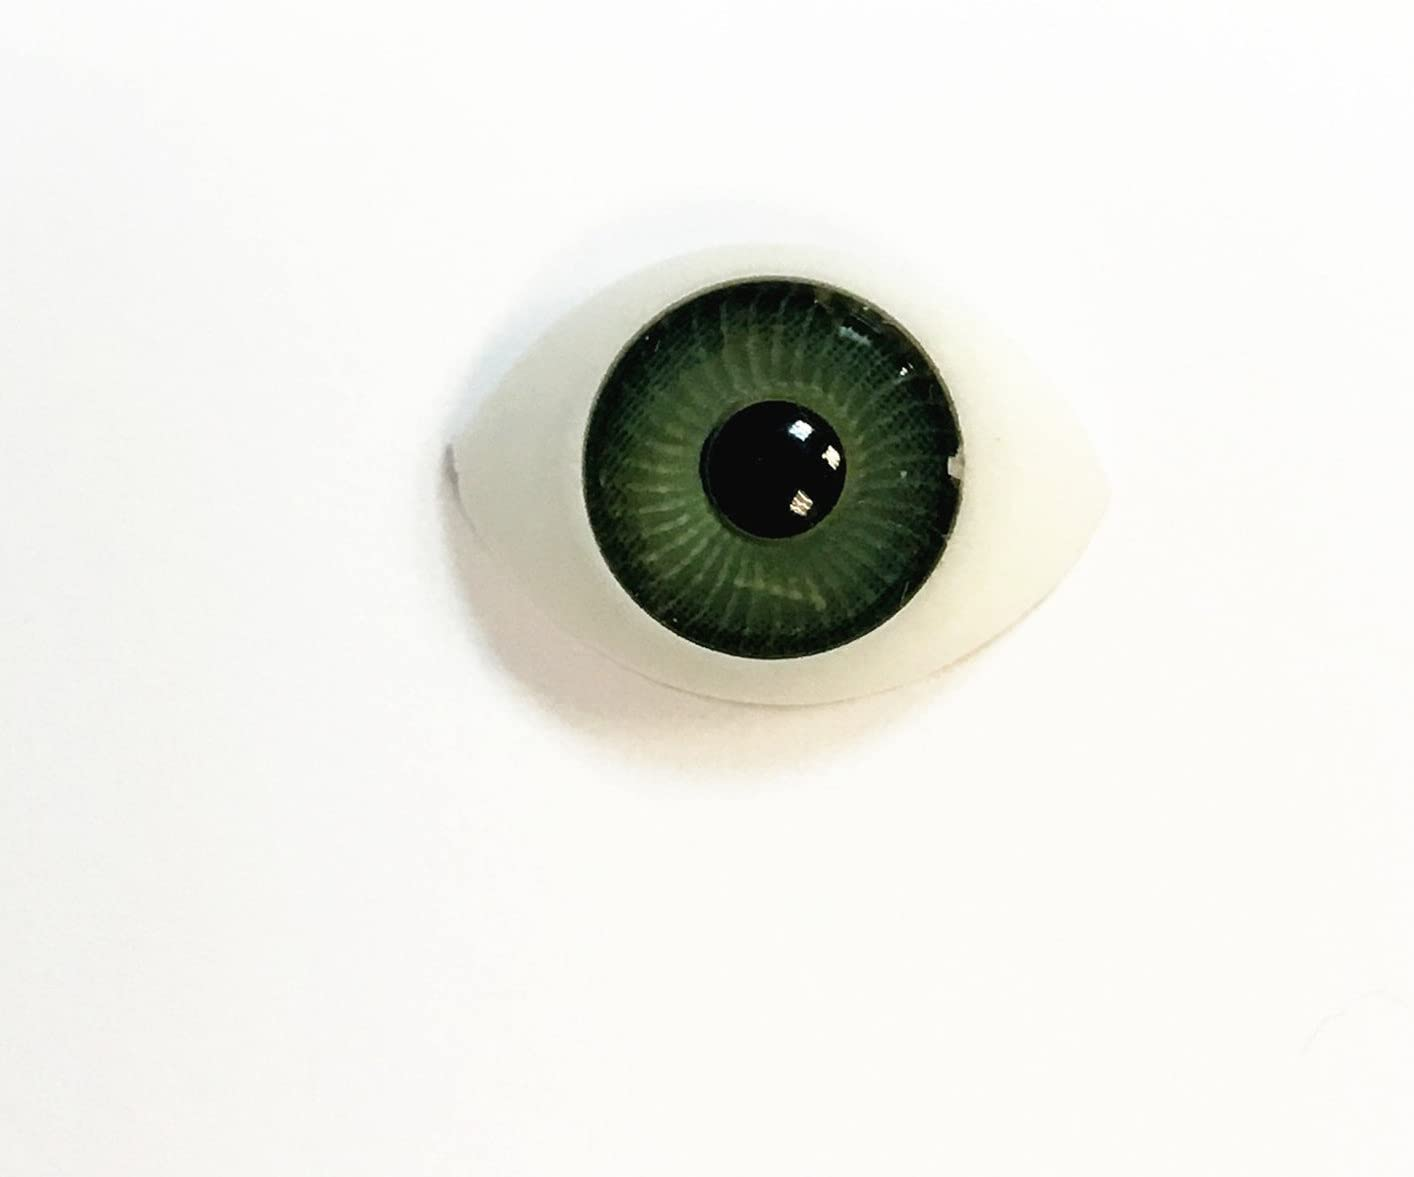 8pcs 9mm Plastic Safety Eyes Eyeballs For BJD Dollfie Bear Doll Crafts